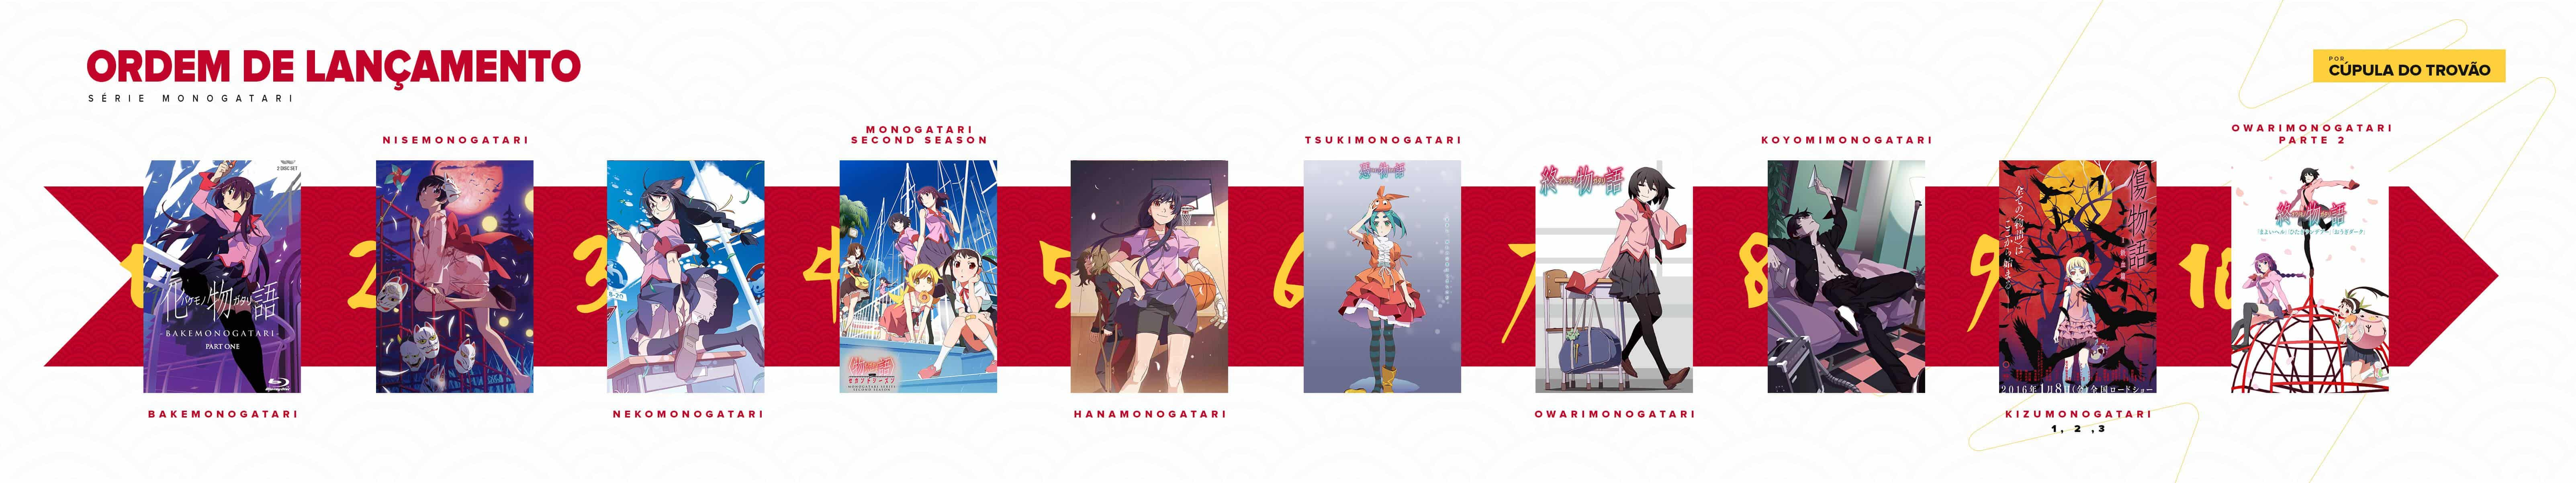 Guia completo Monogatari Series ordem de lançamento